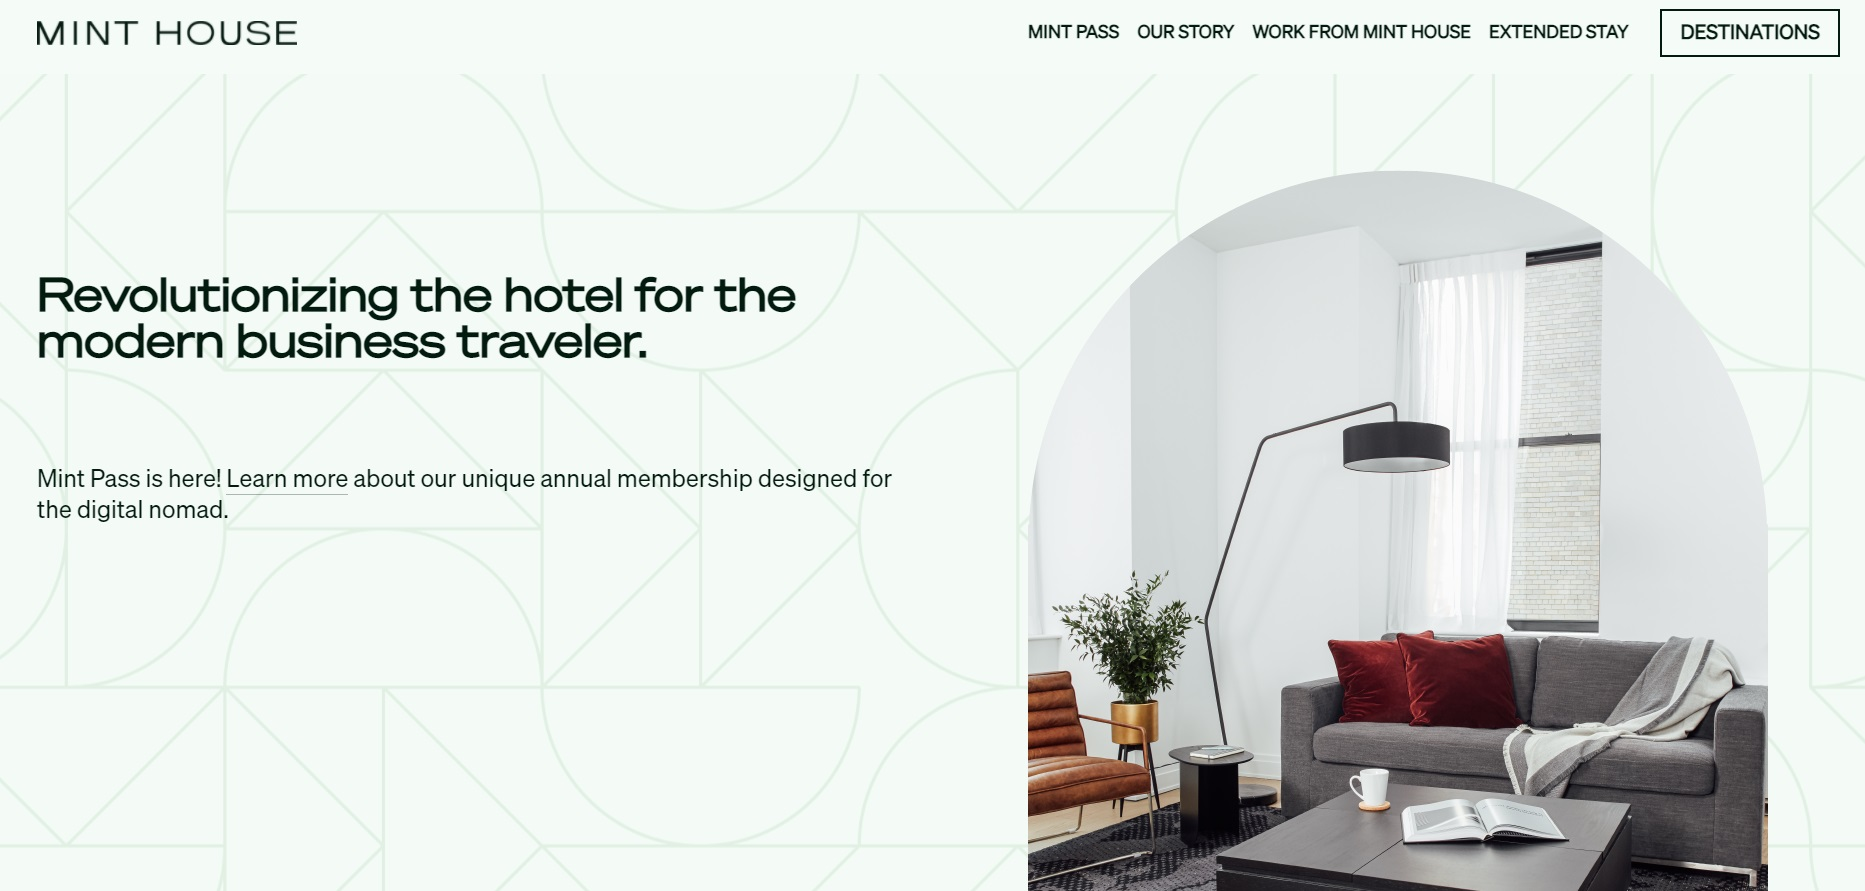 03_A keyless entry app on the Mint House website screenshot